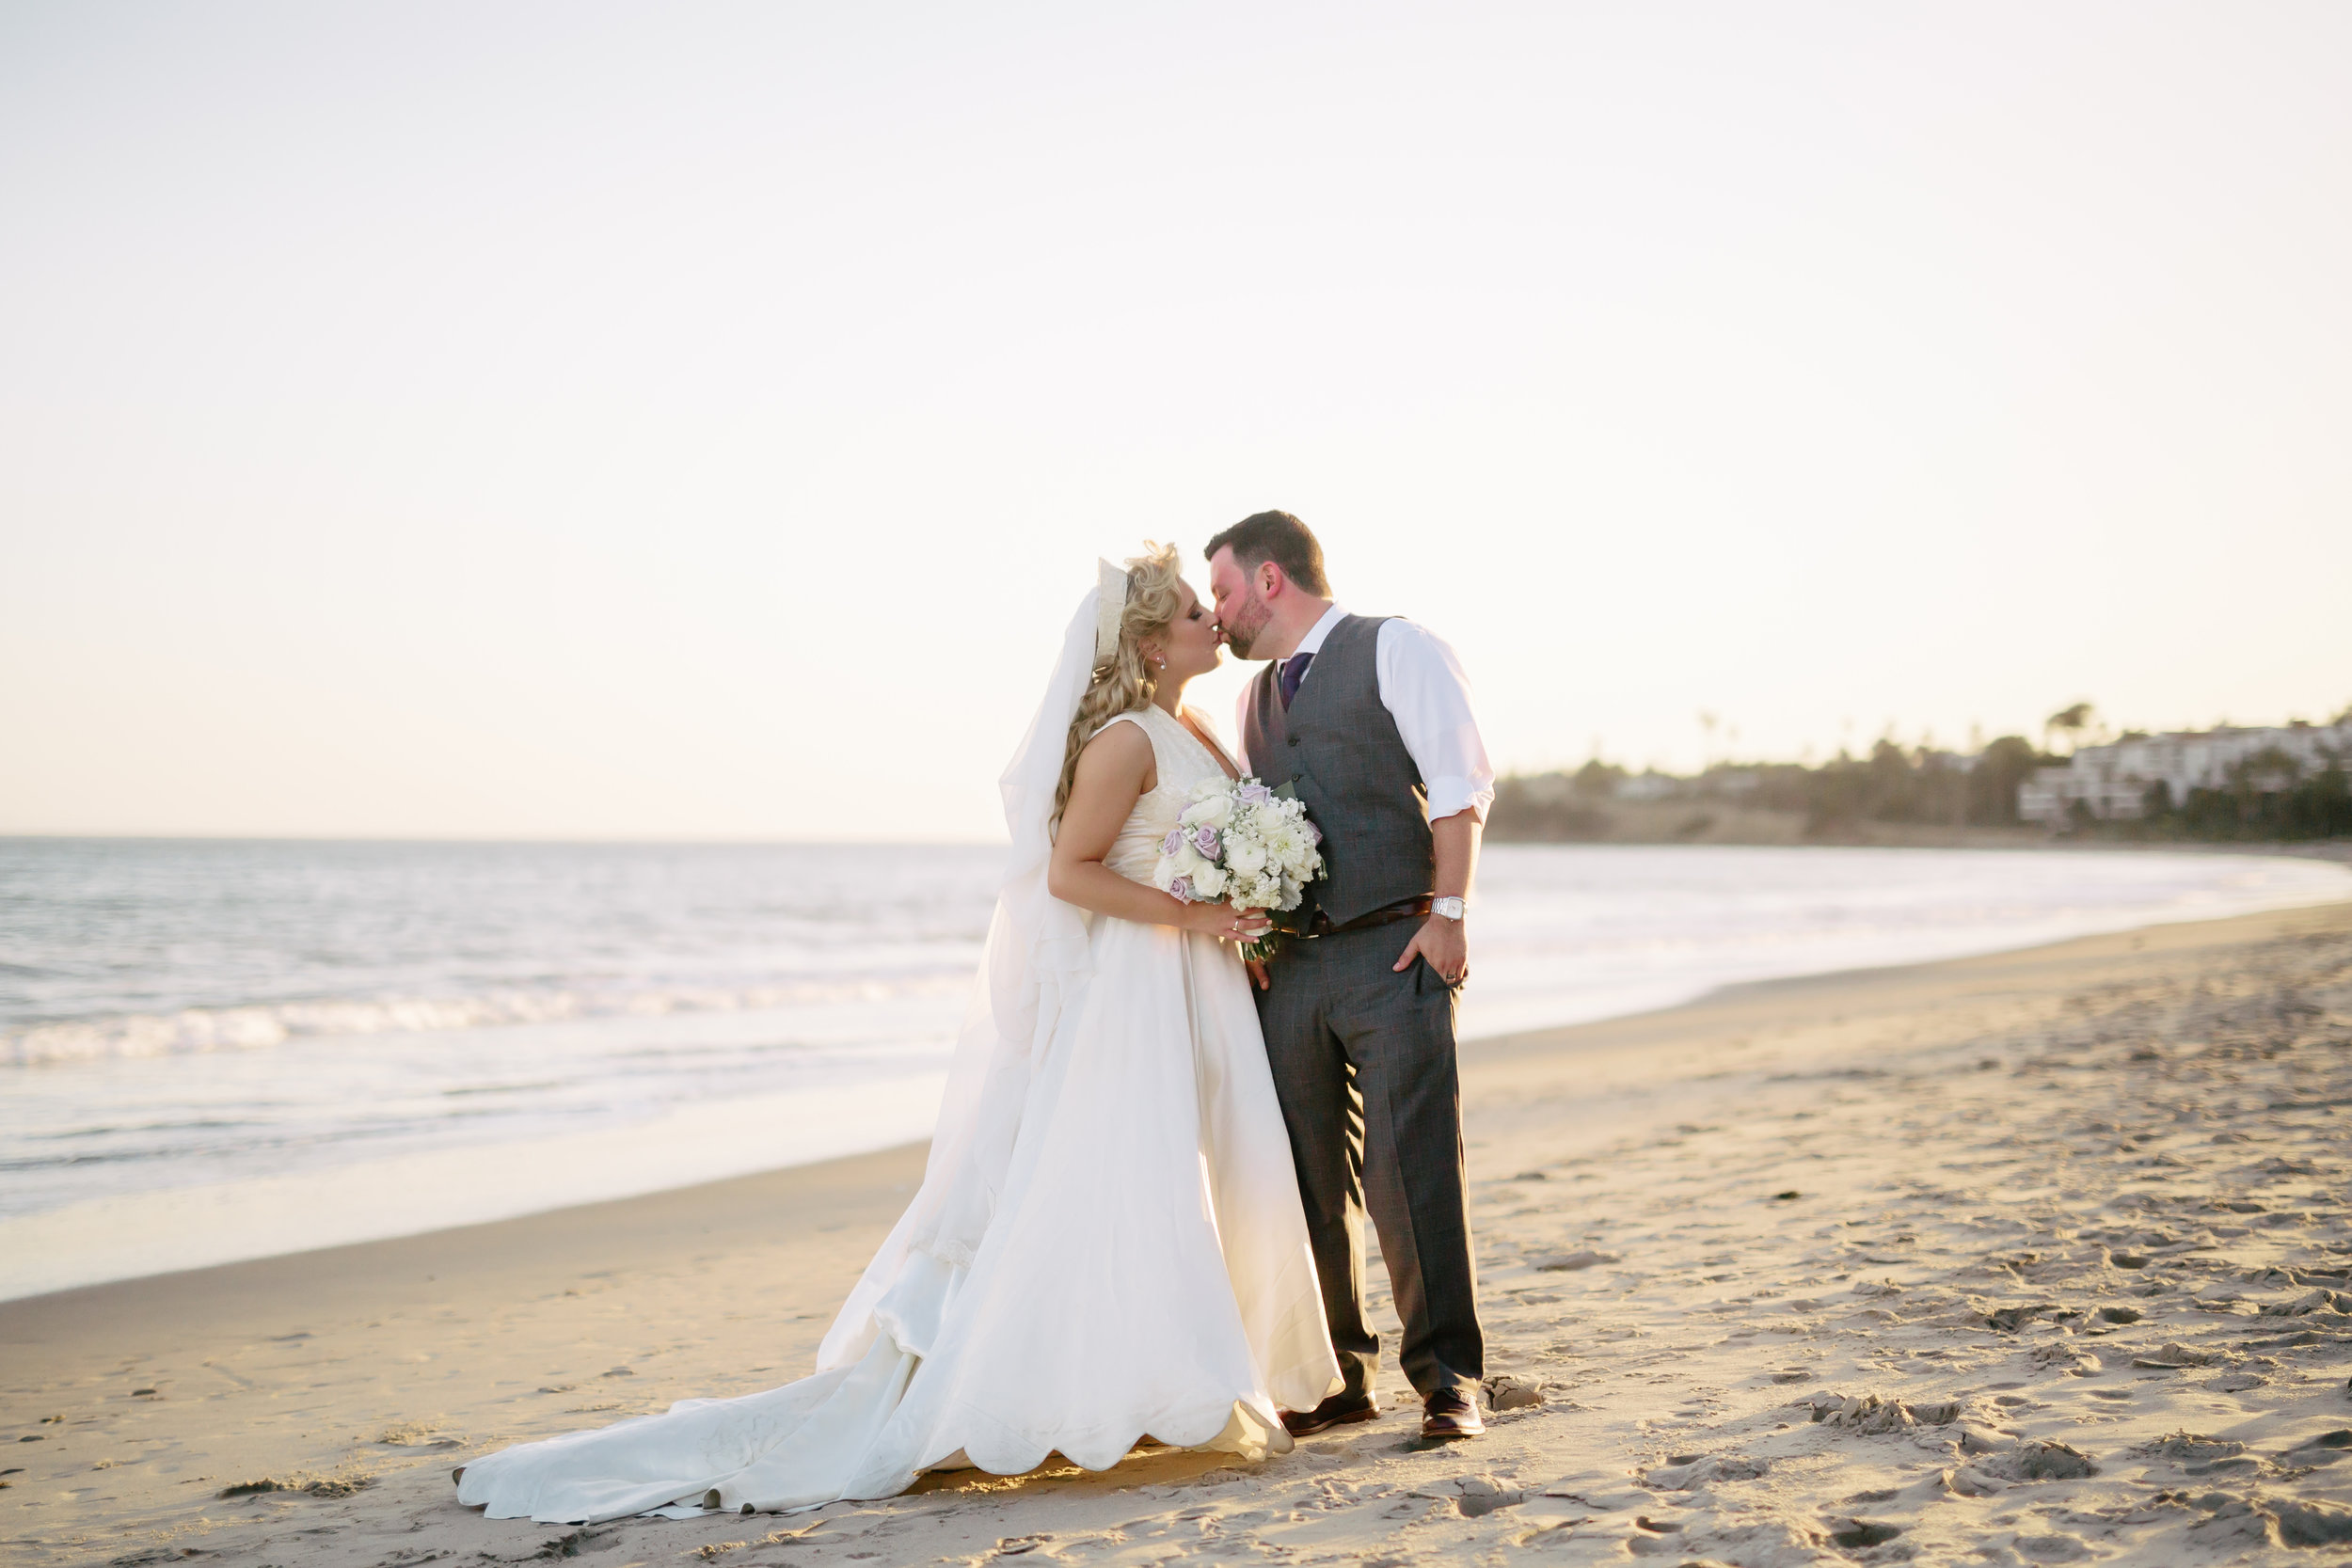 www.santabarbarawedding.com | Rewind Photography | SB Maritime Museum | Santa Barbara Mission | Bride and Groom